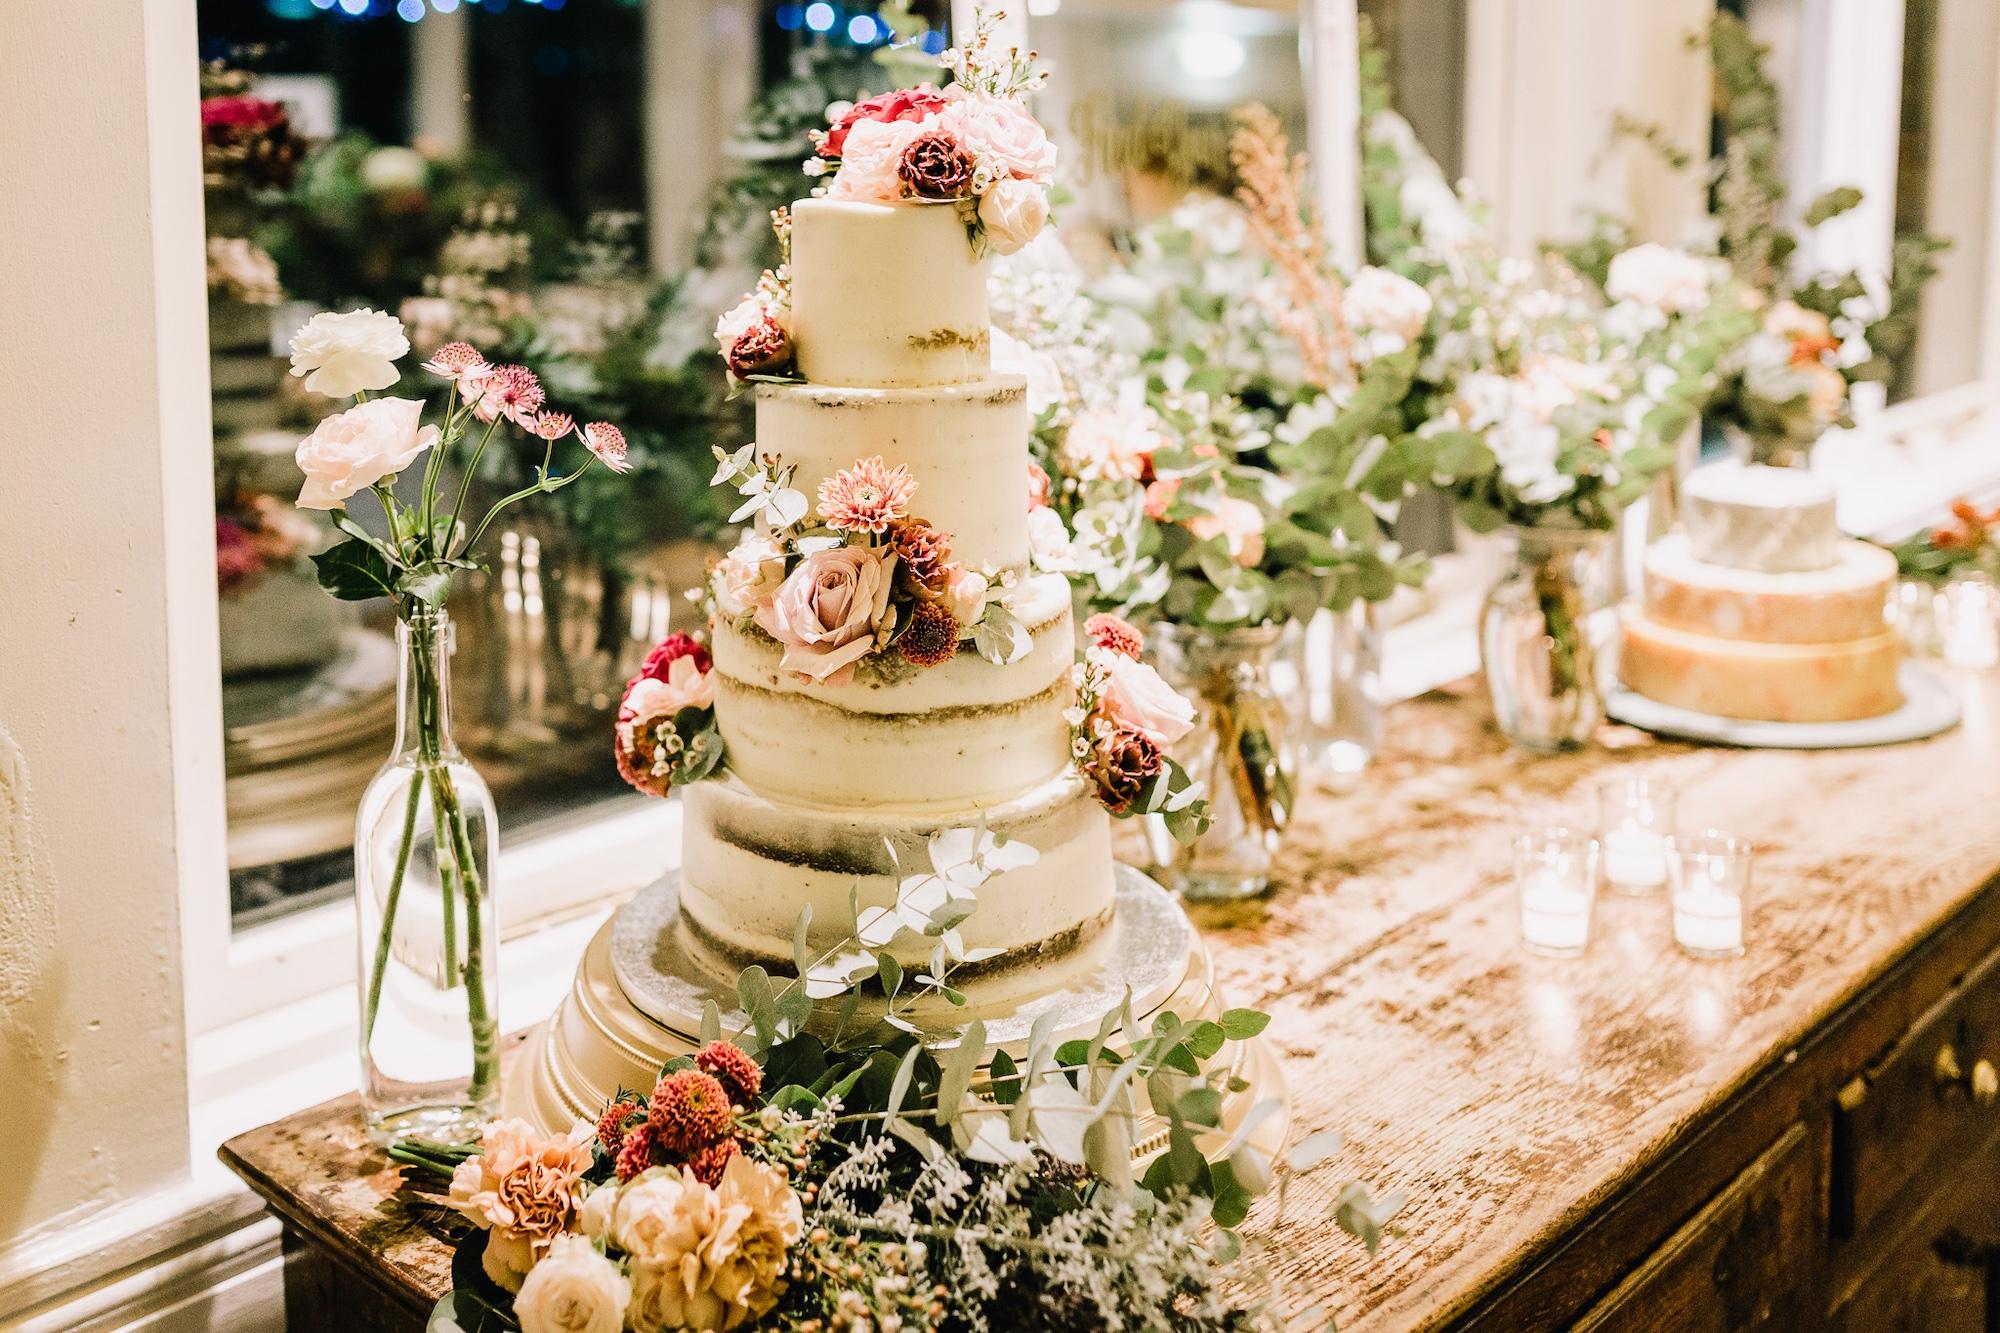 The Glorious Bakery_Cake08 2000x1333.jpg